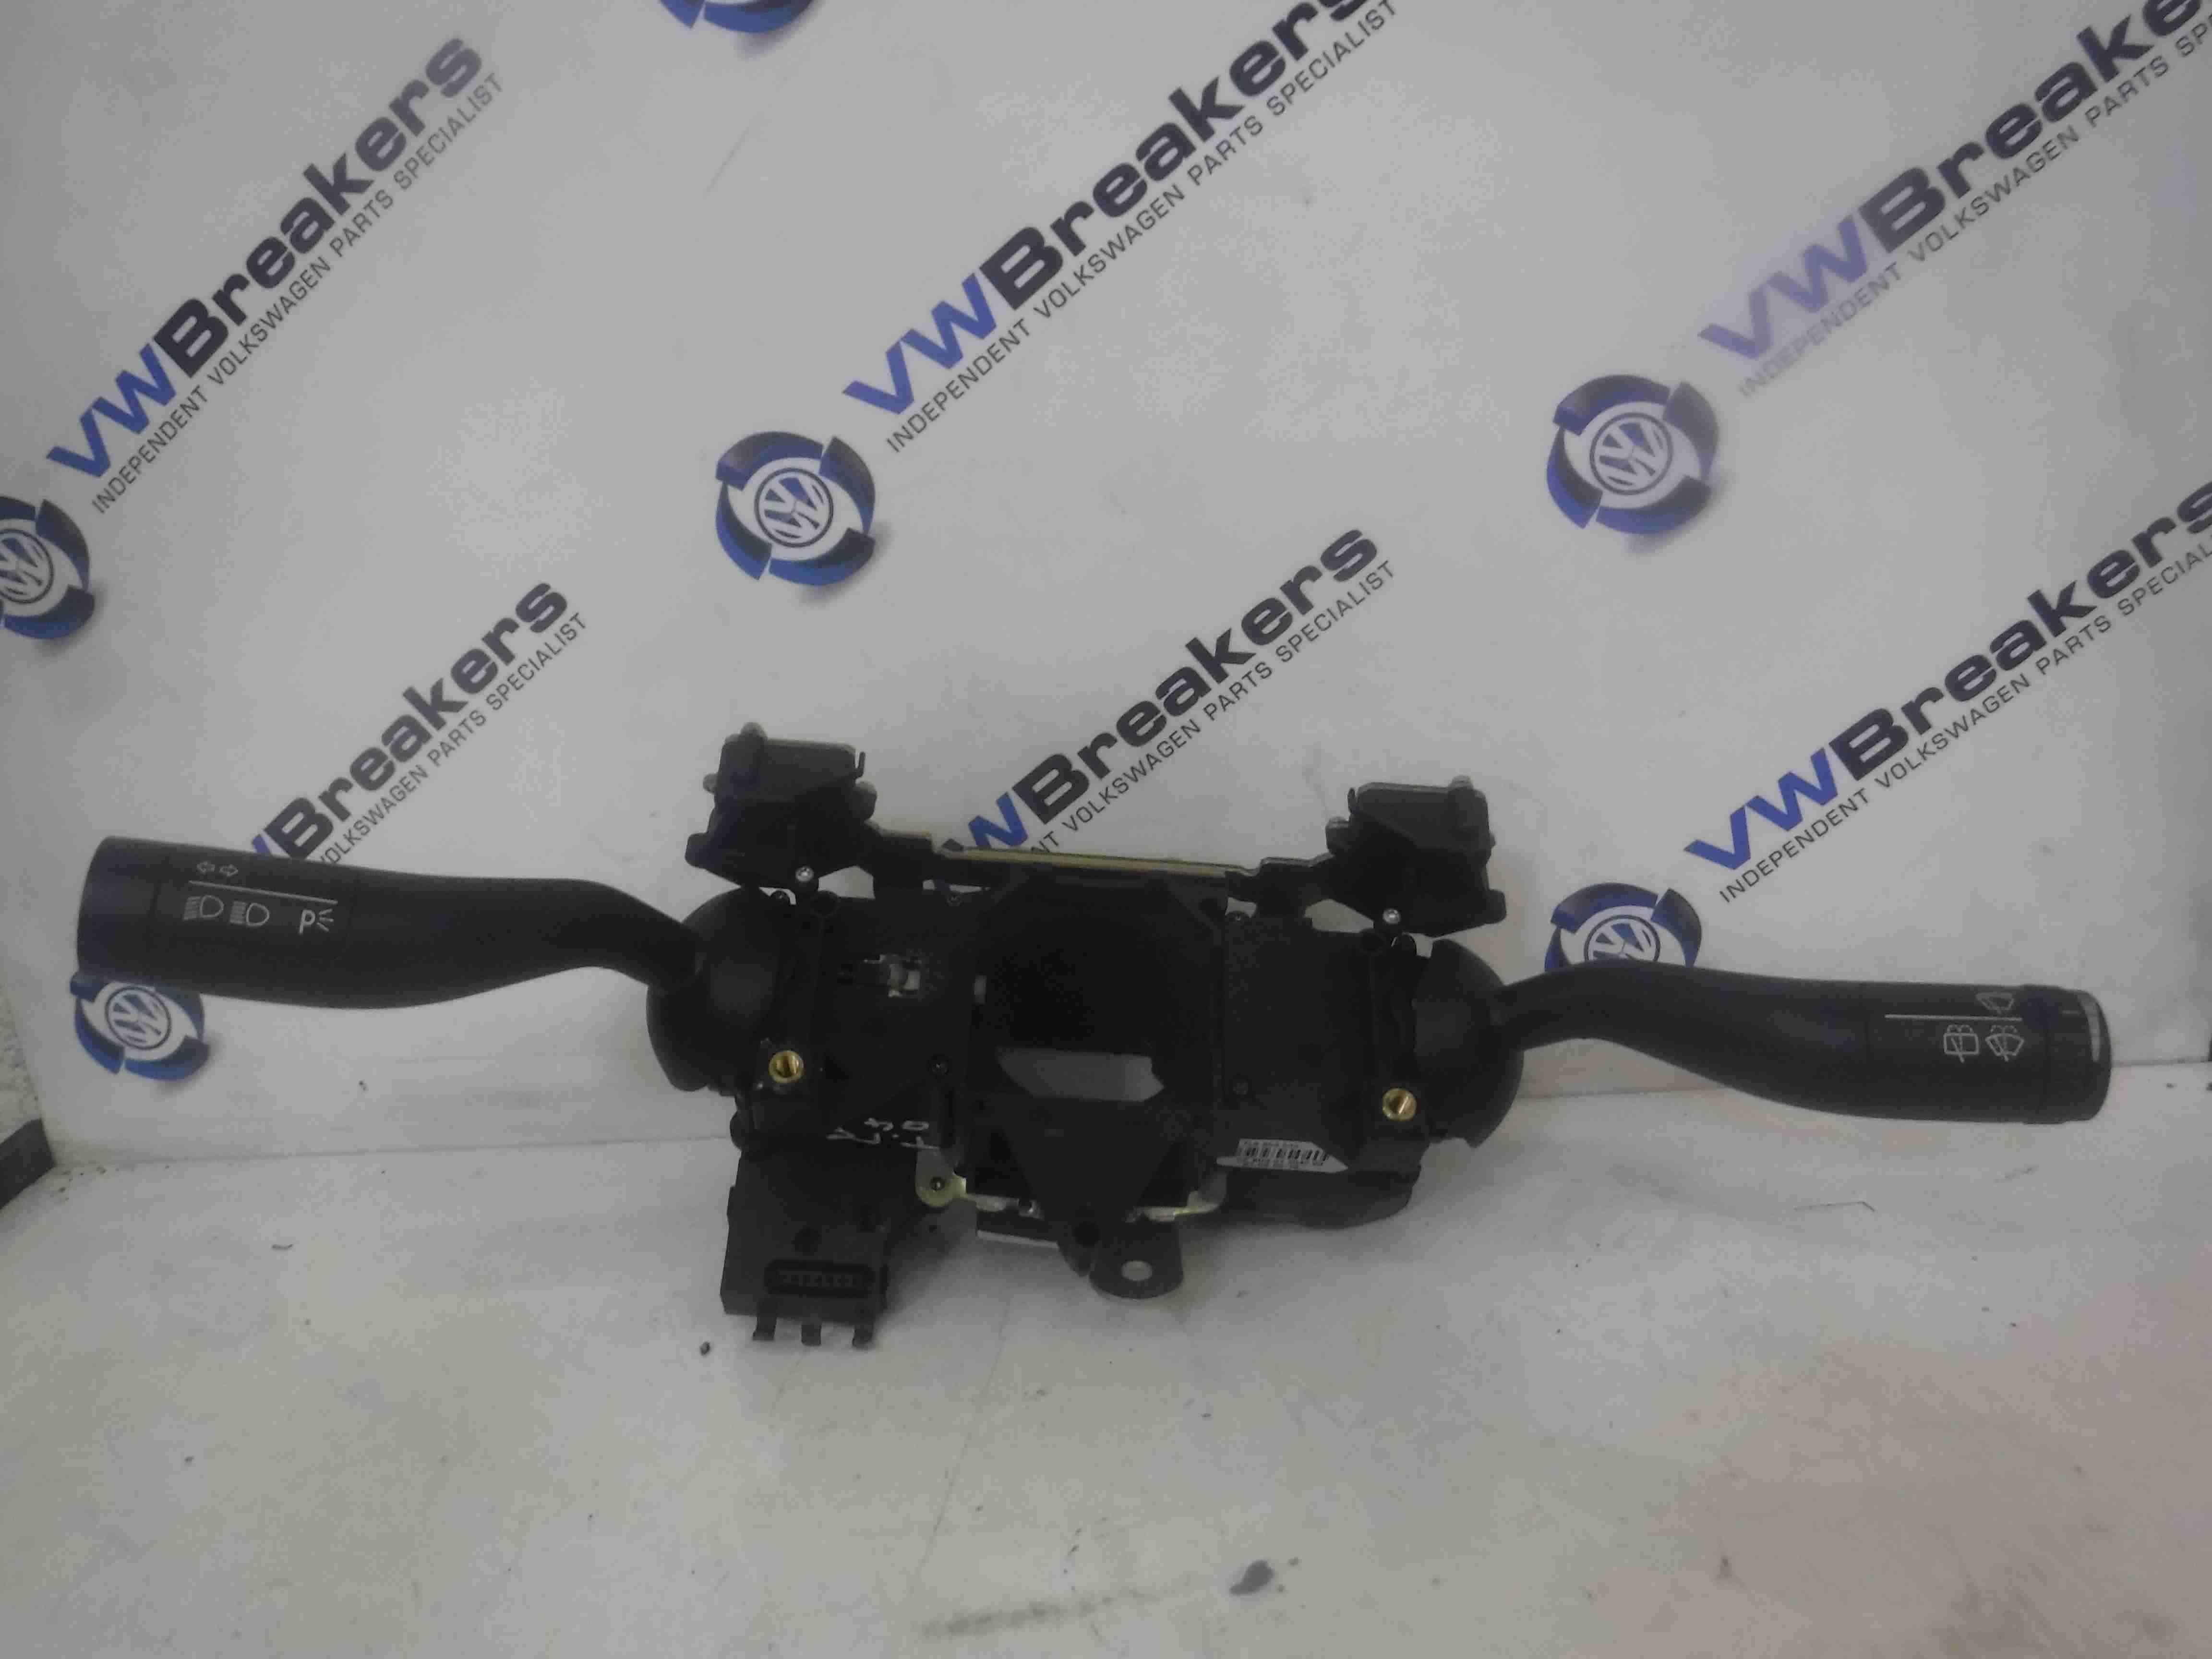 Volkswagen Touareg 2002-2007 Indicator Headlight Washer Stalk Module 7L6953503